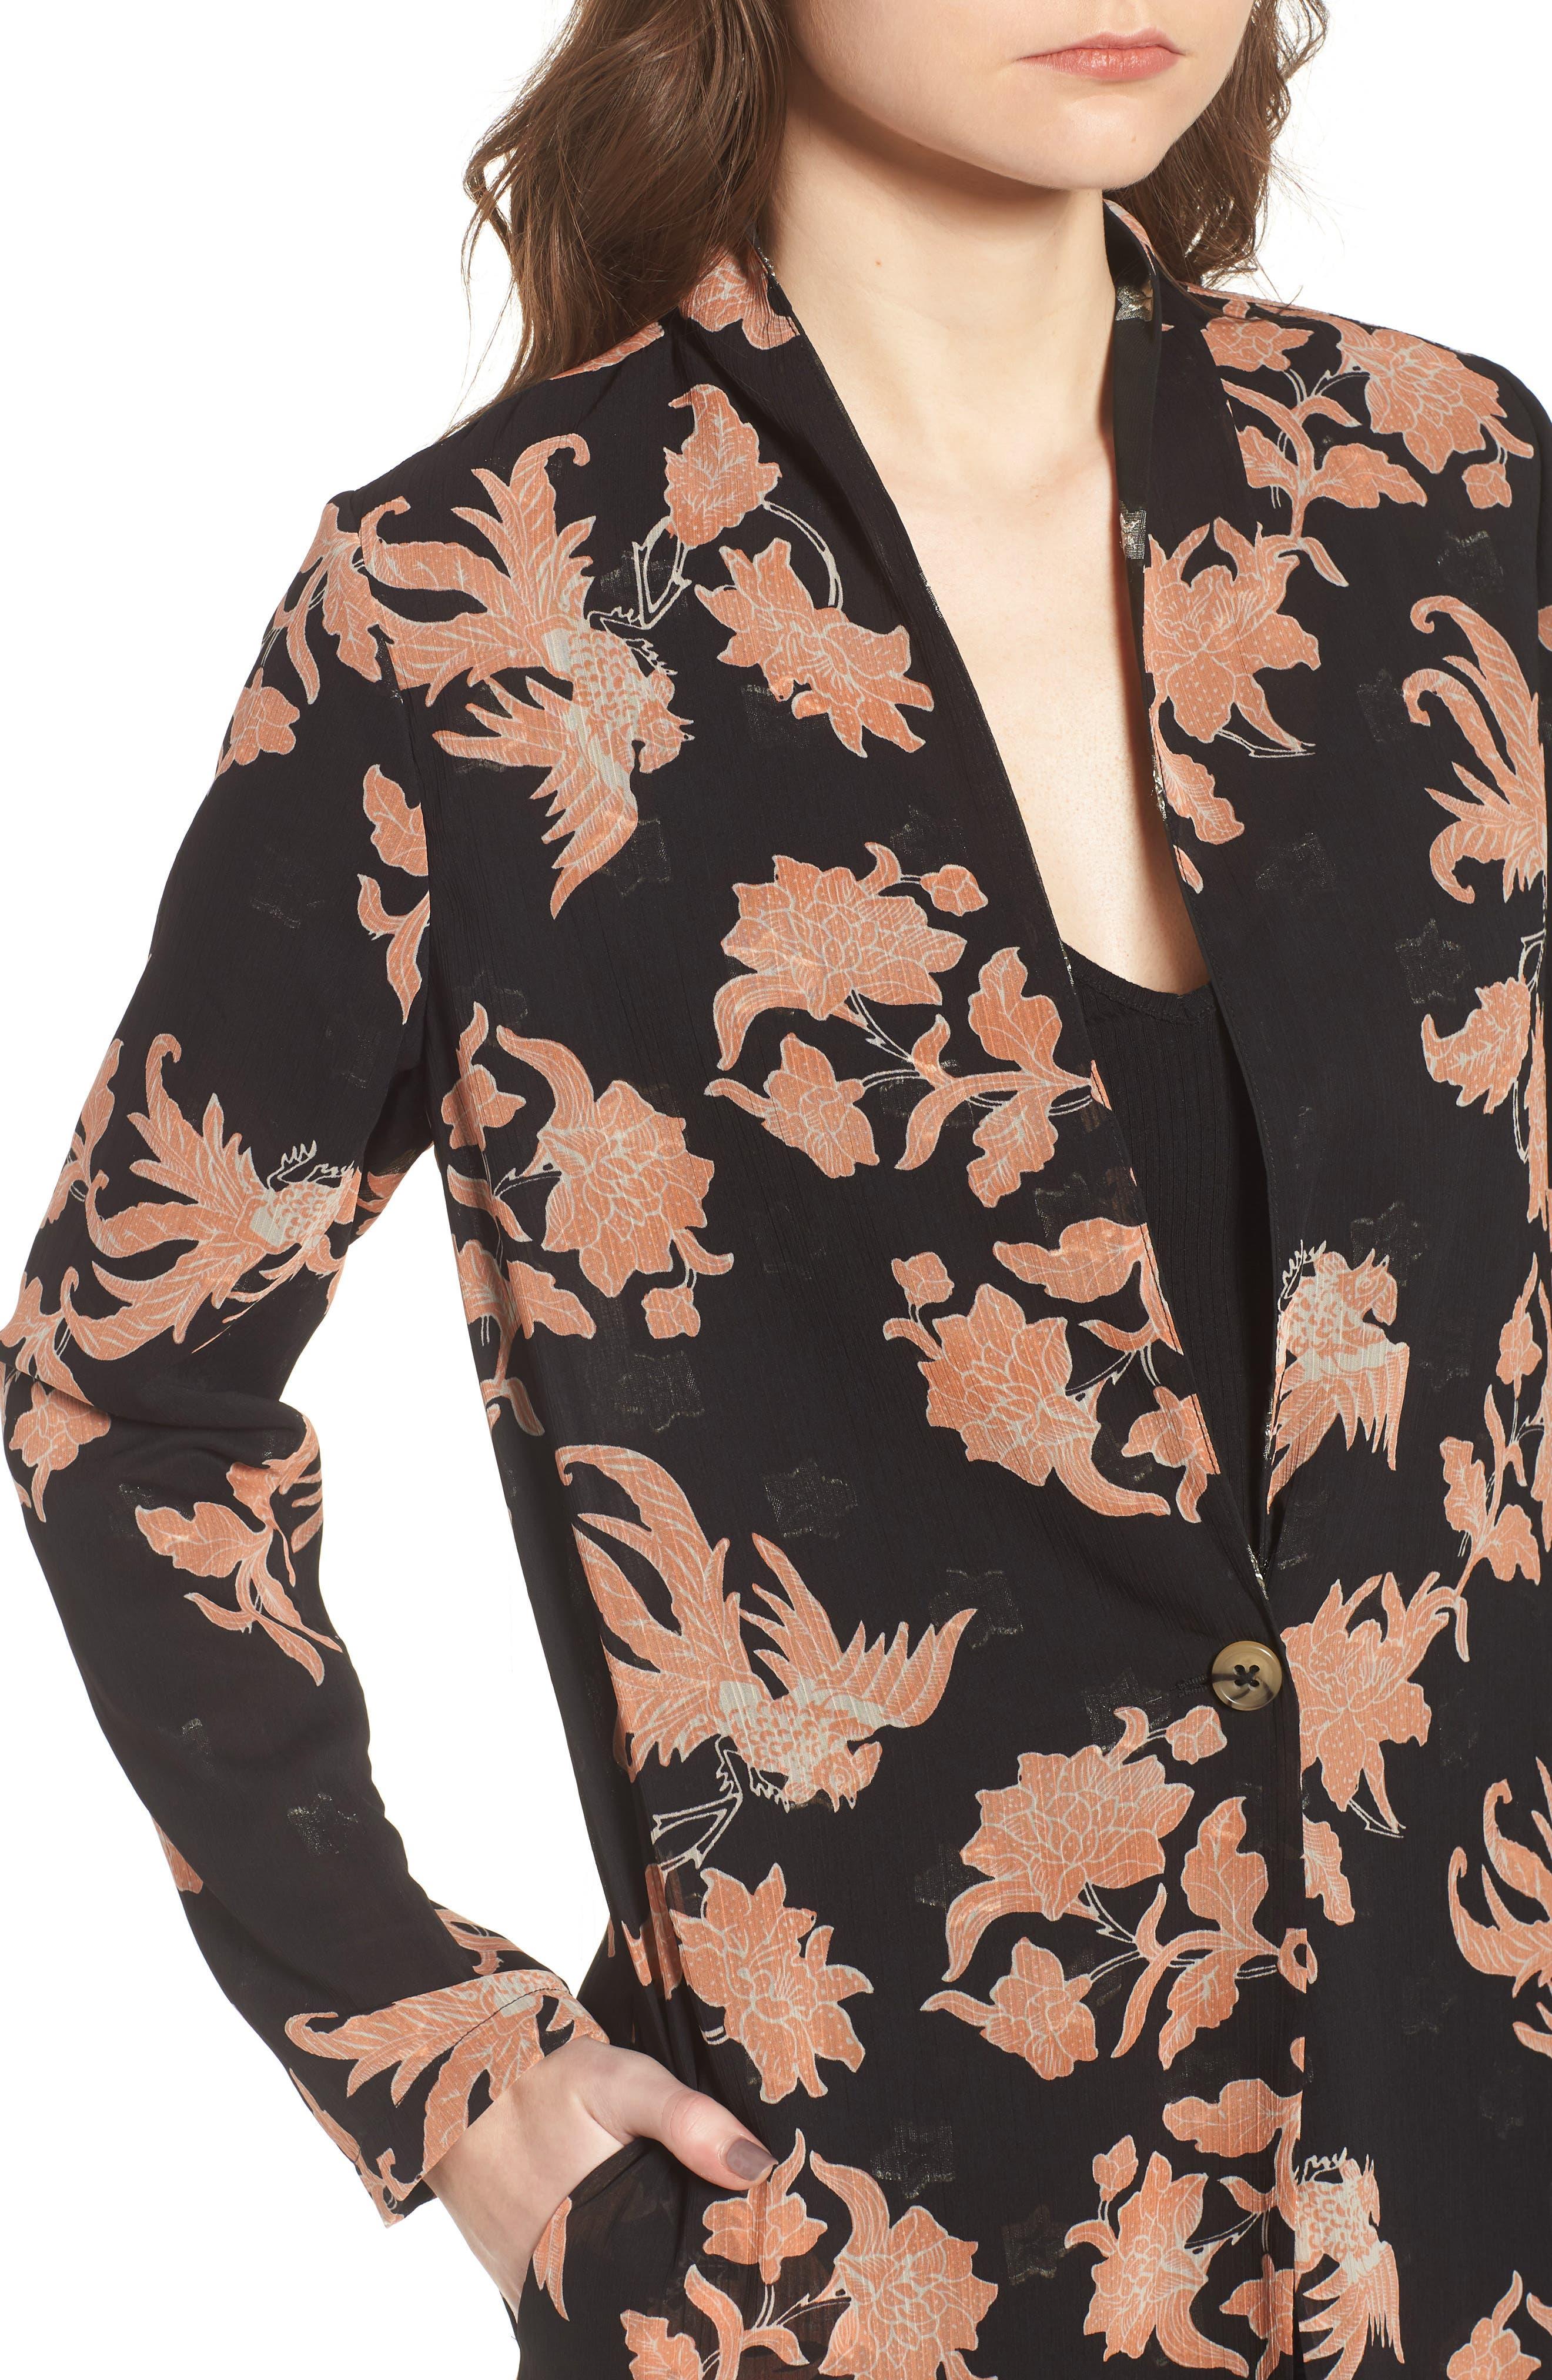 Floral Print Drape Duster Jacket,                             Alternate thumbnail 4, color,                             001